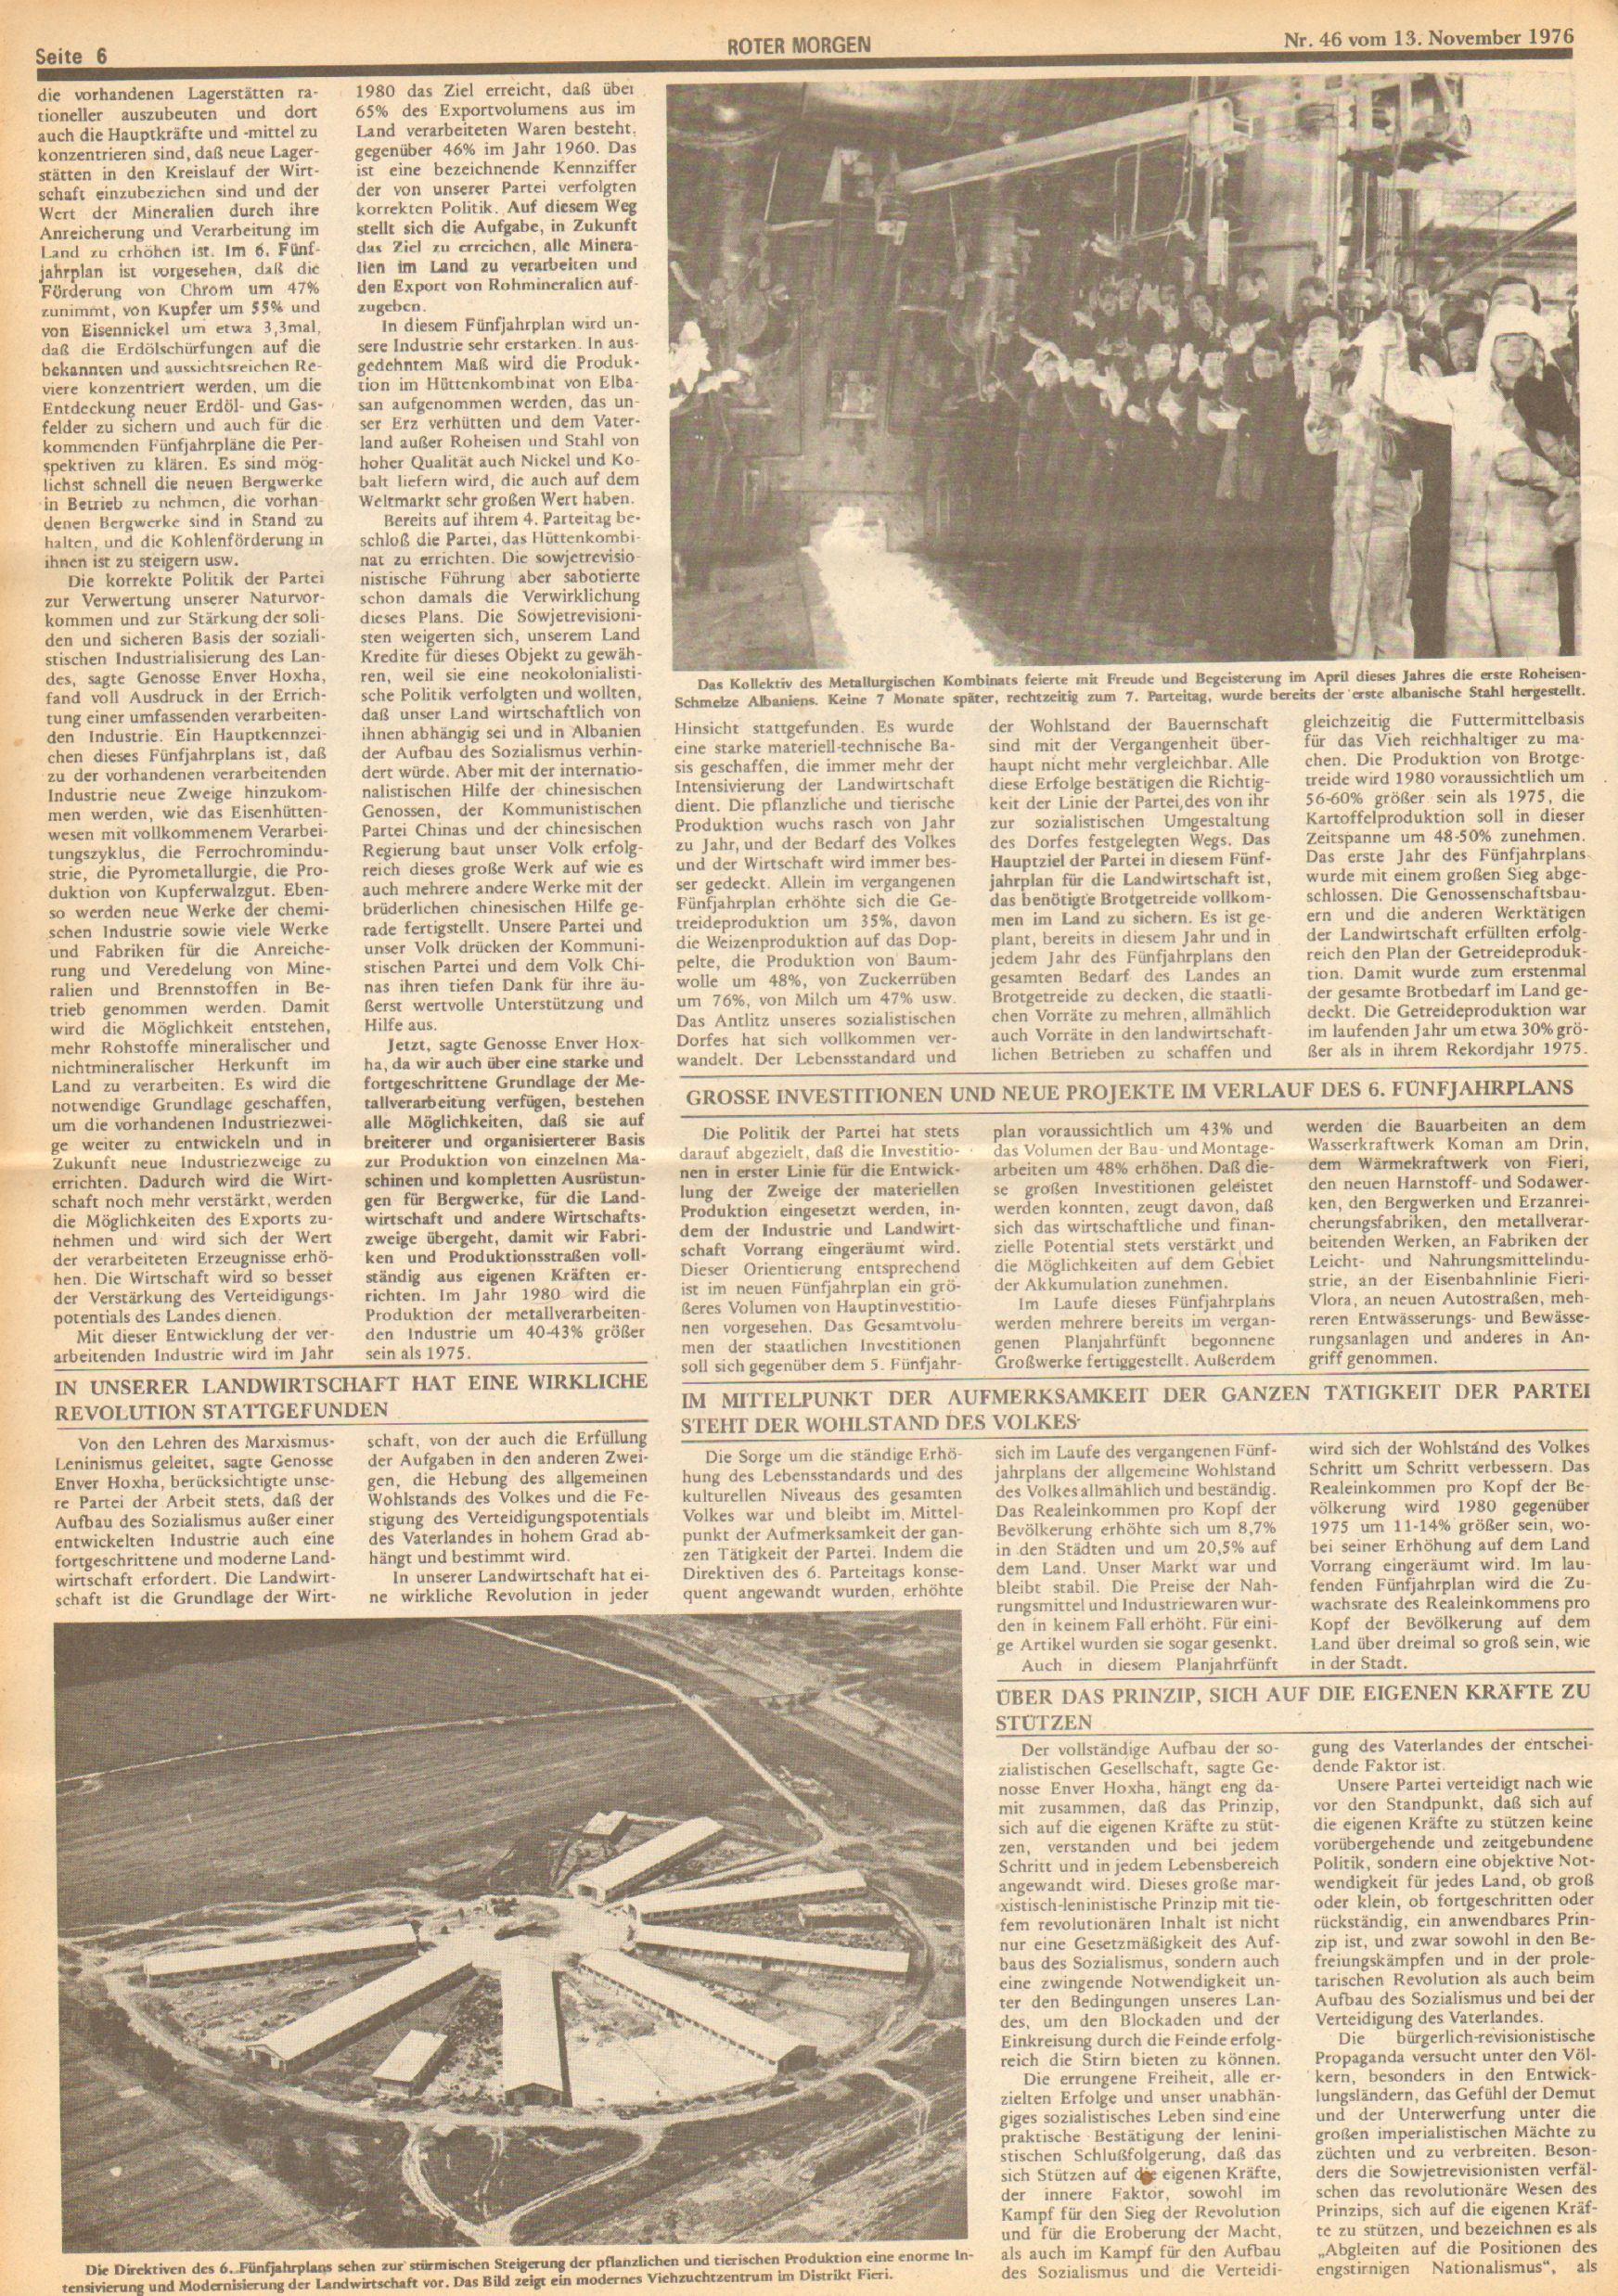 Roter Morgen, 10. Jg., 13. November 1976, Nr. 46, Seite 6